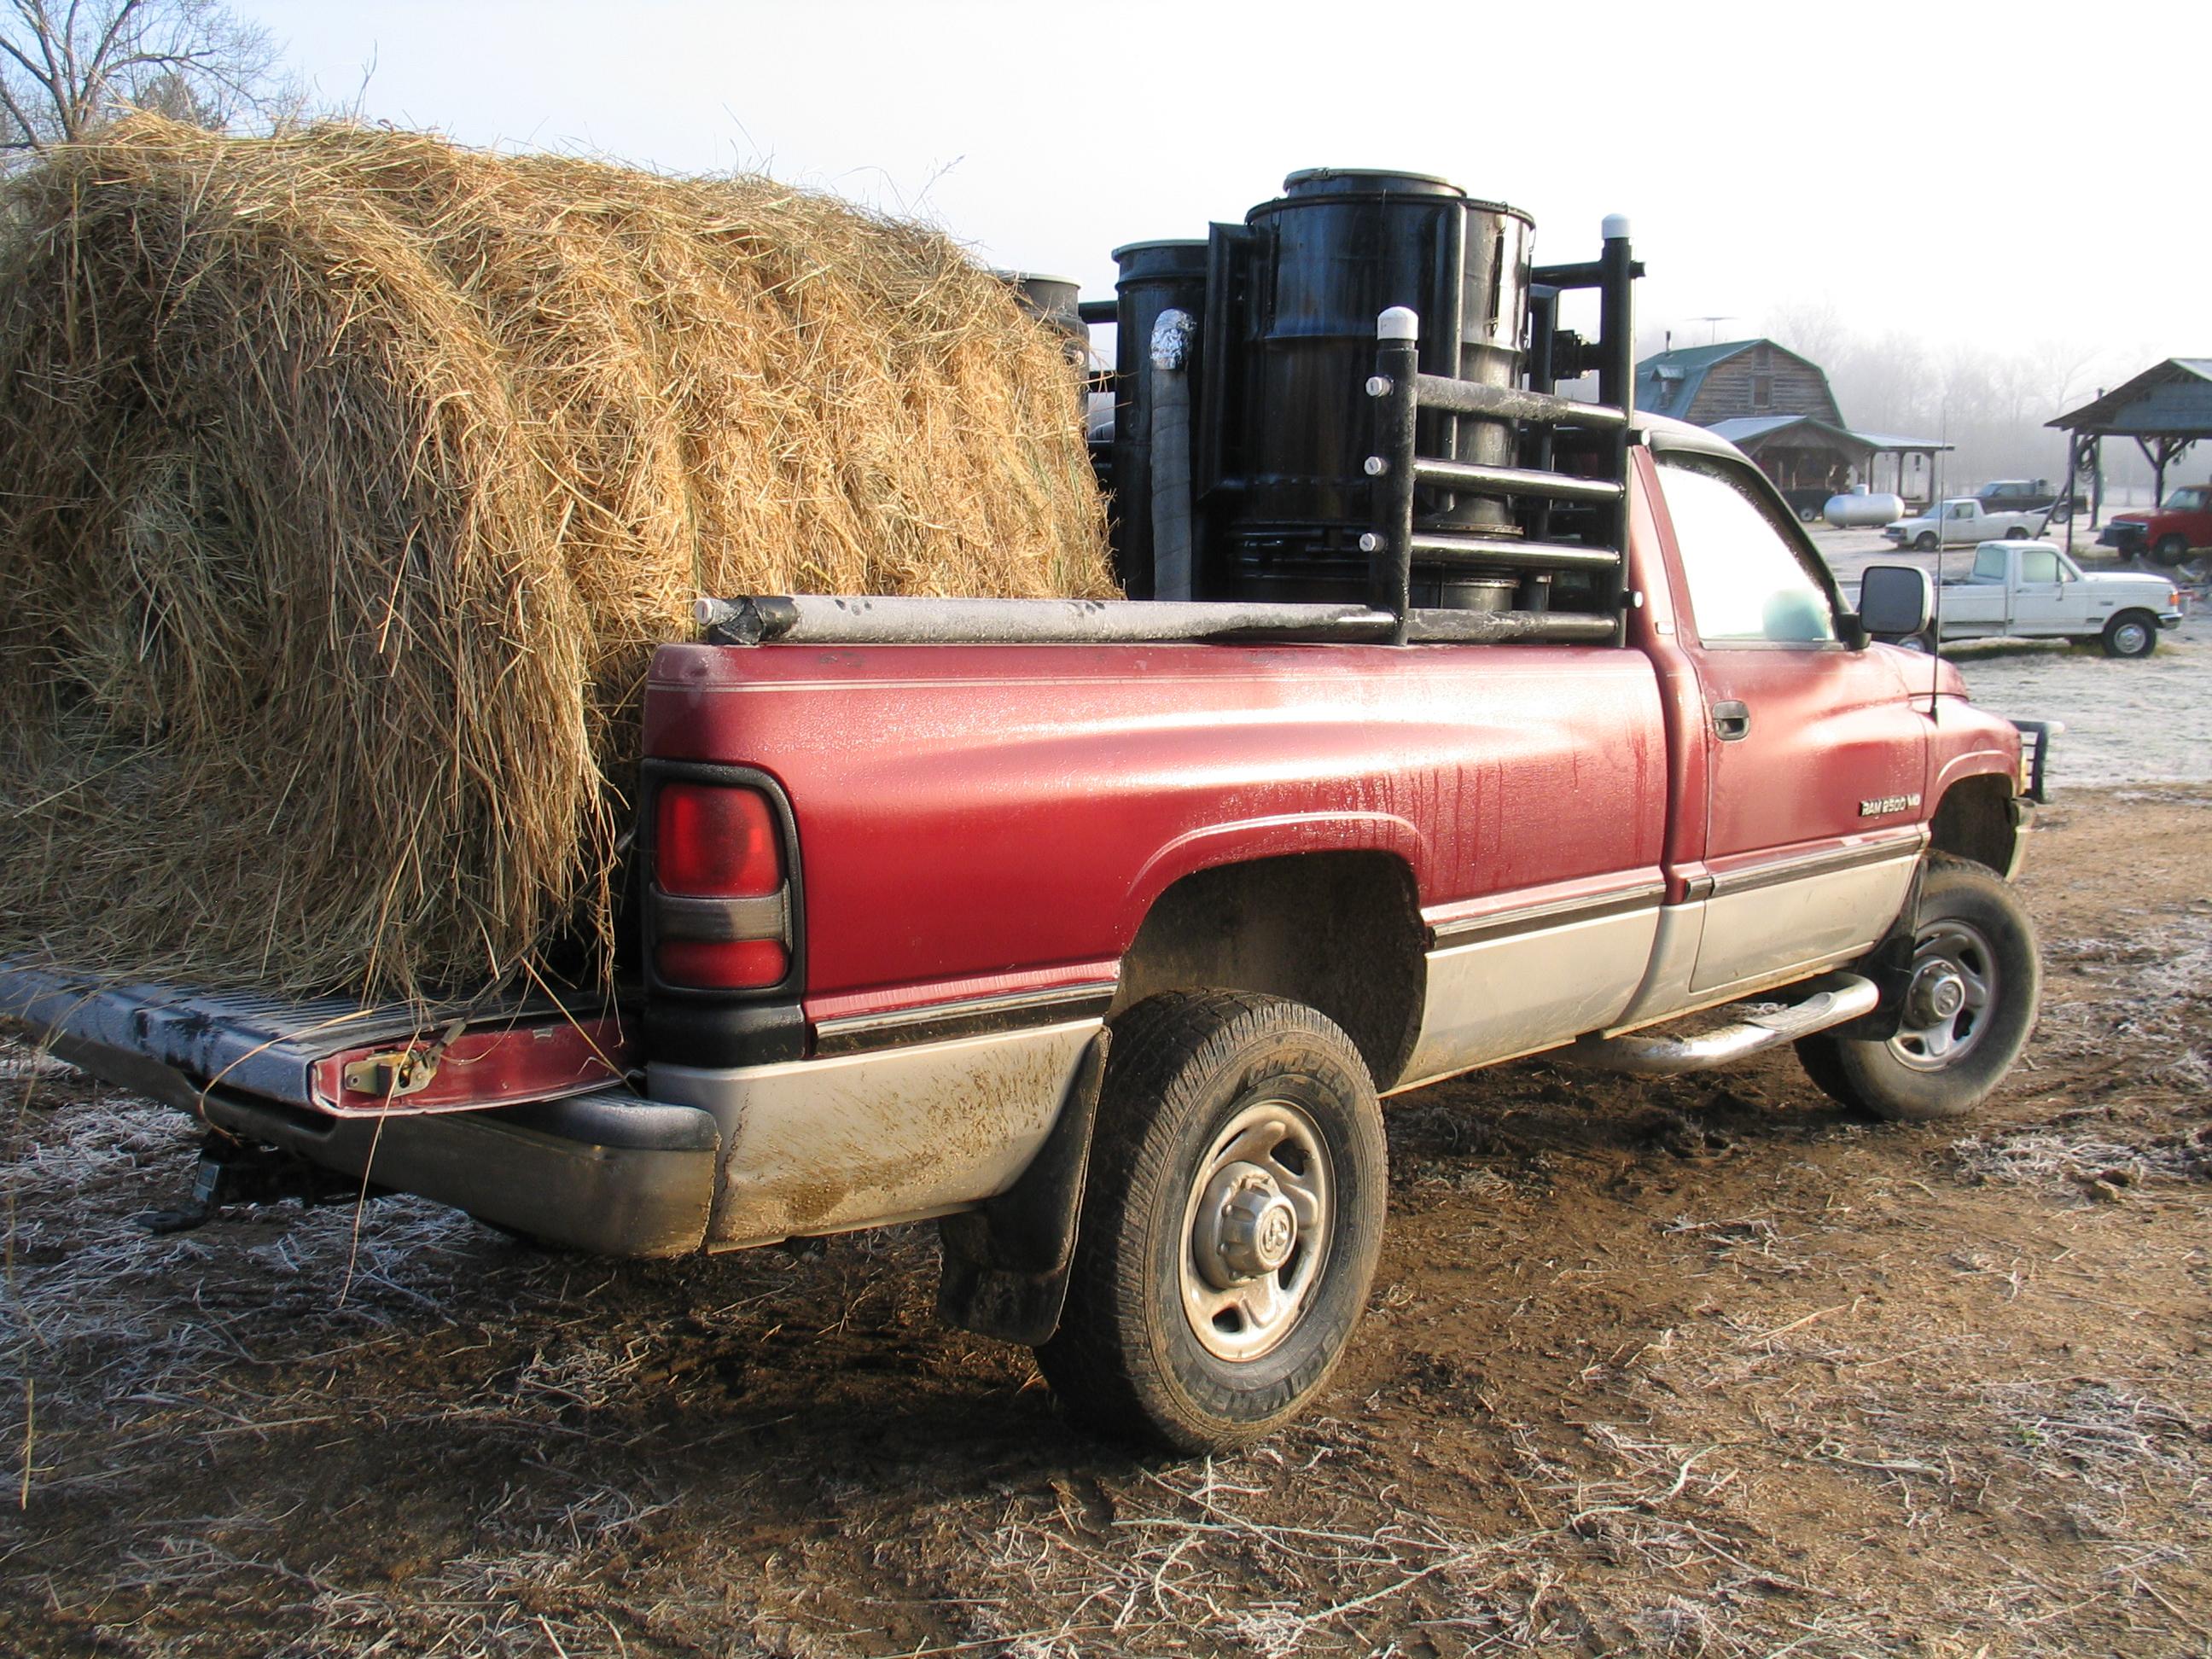 Wood Gas Generator Wikipedia Dirty Fuel Filter On Truck